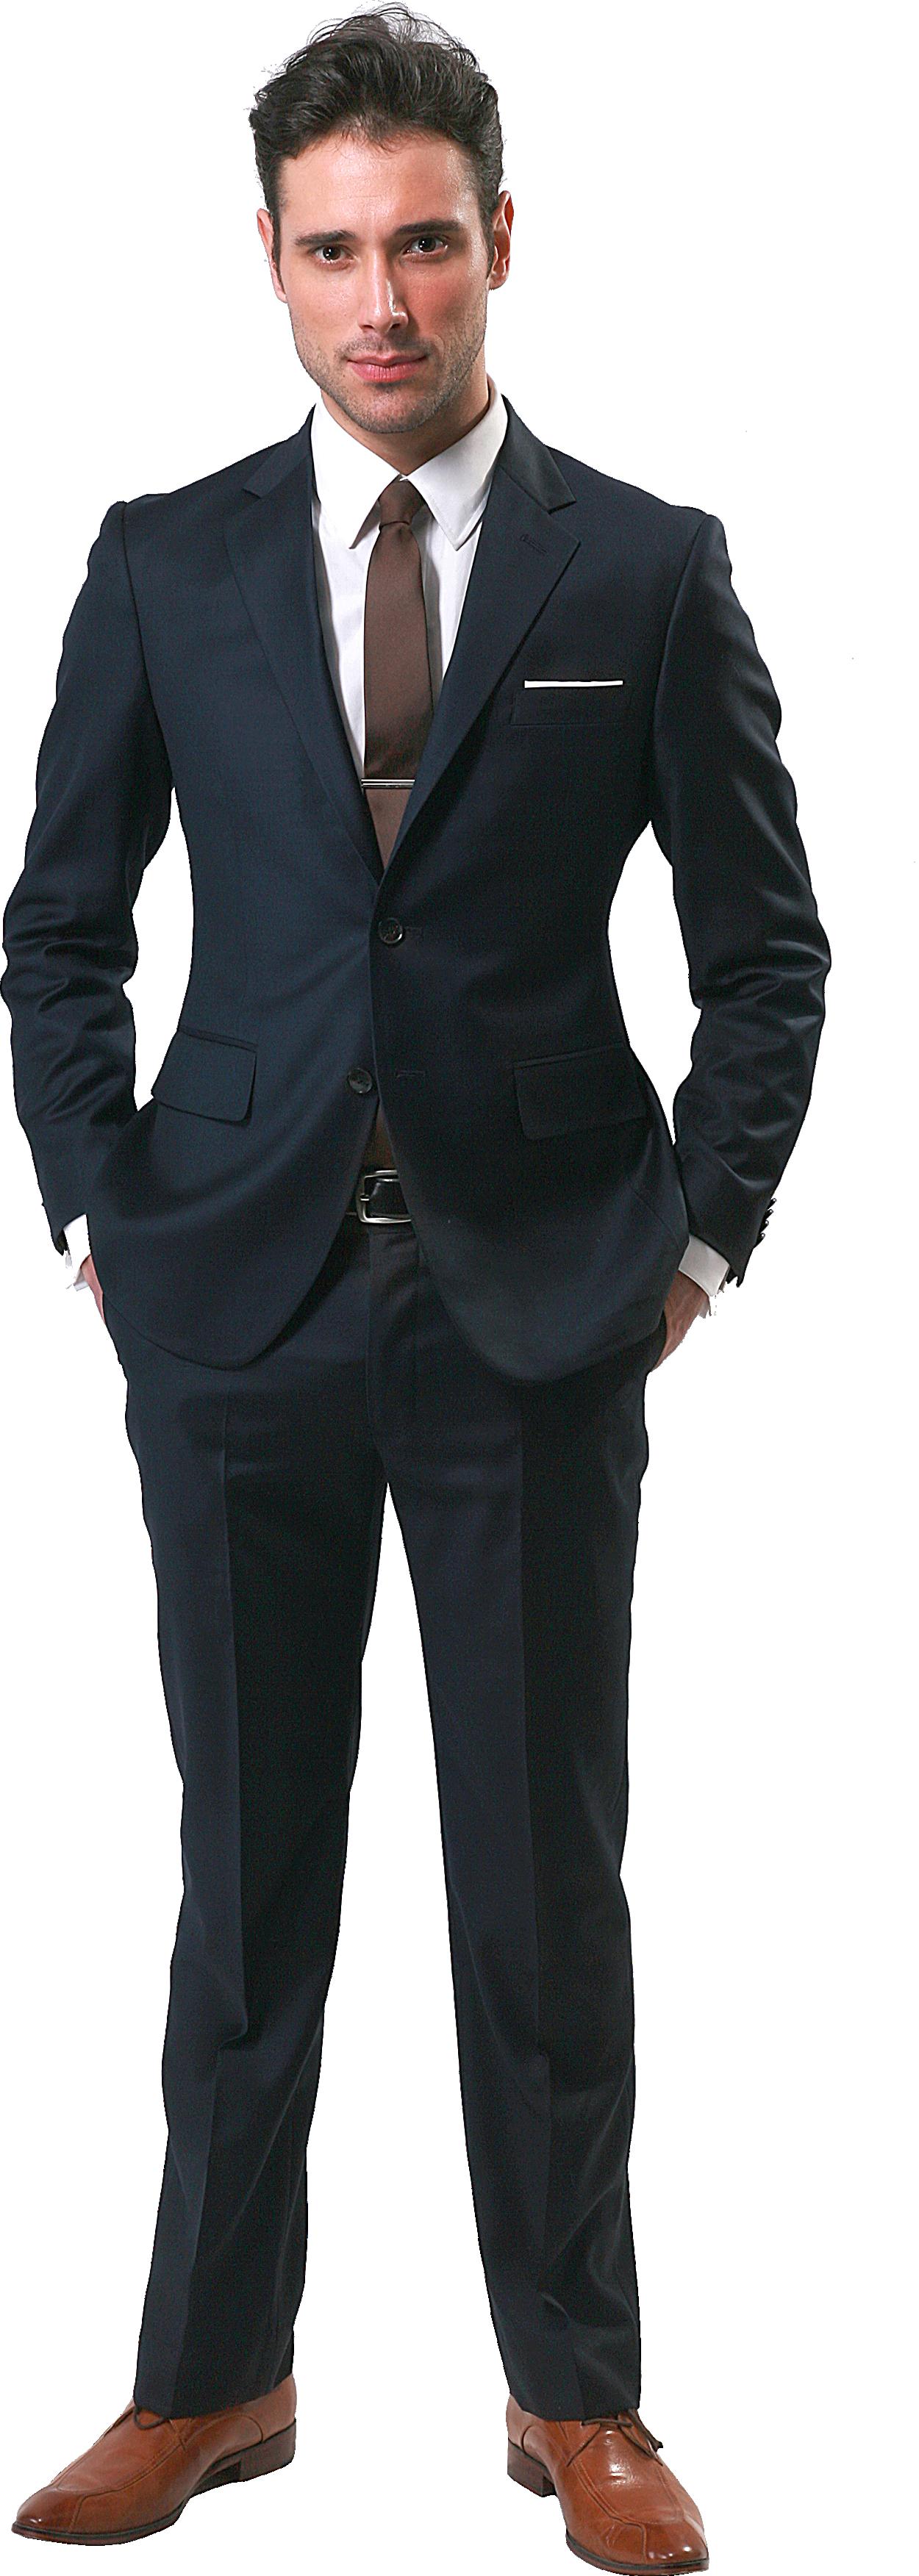 Businessman PNG - 5643